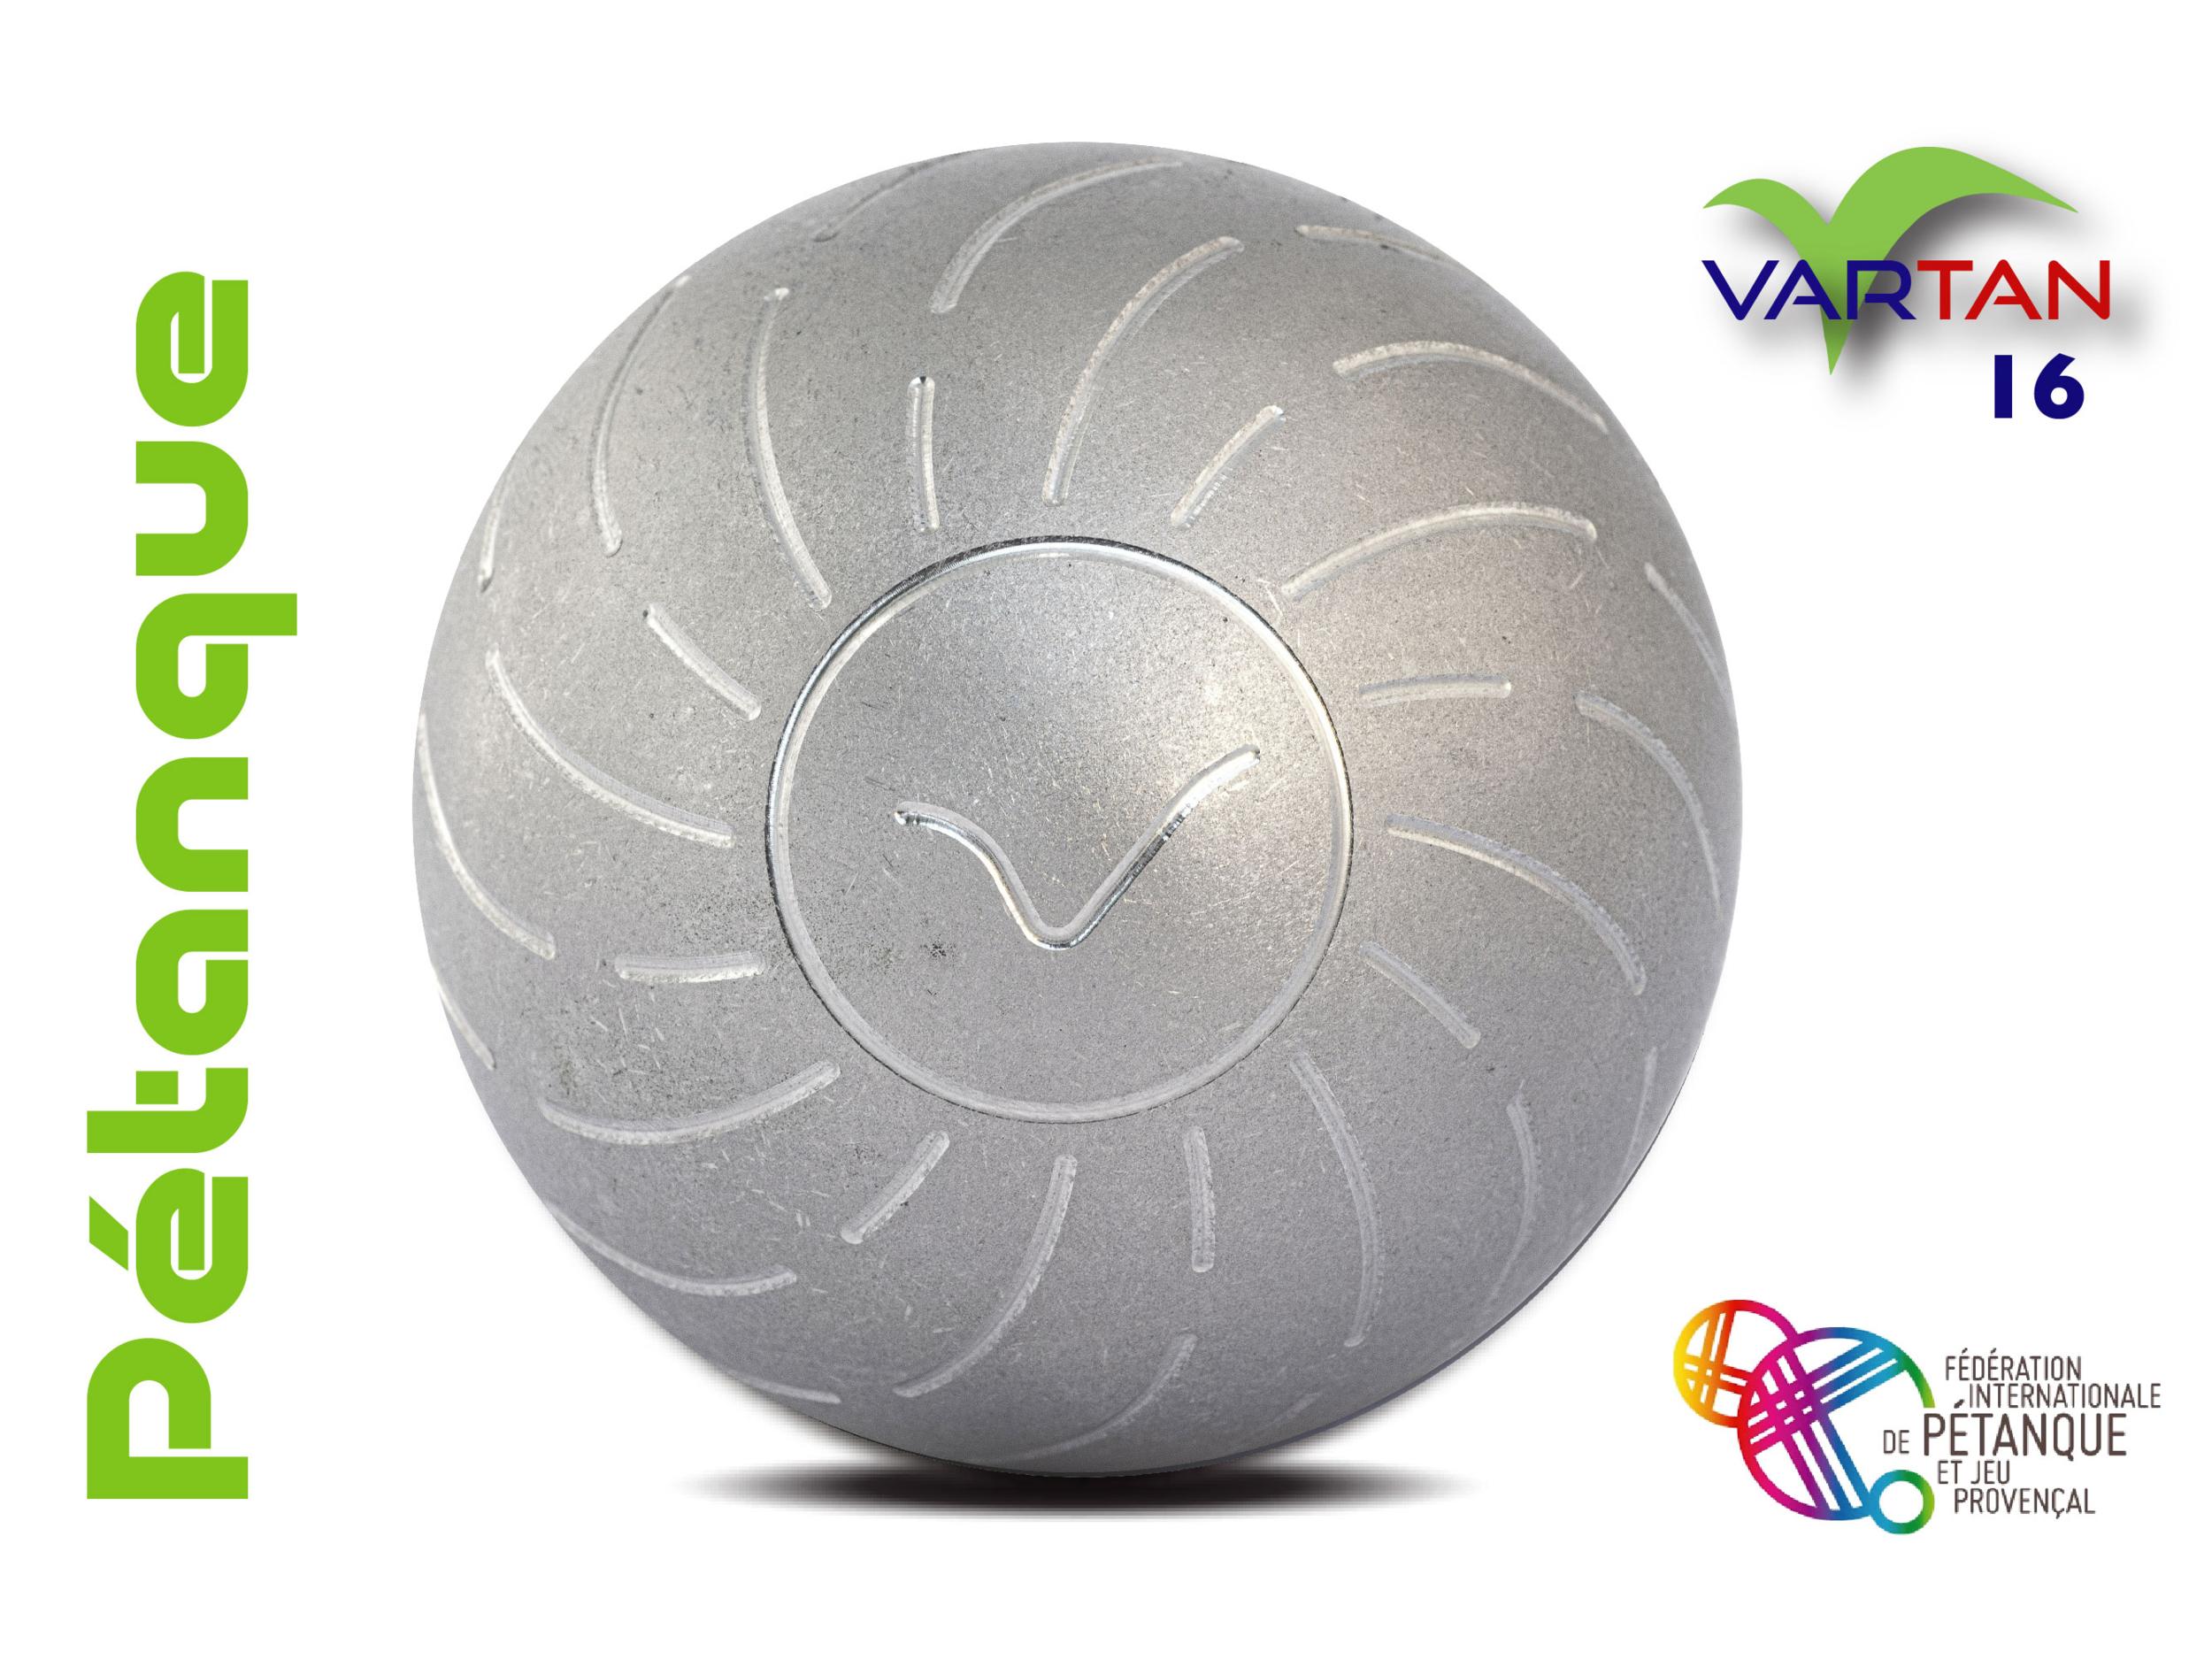 VARTAN INOX POUR MAIN DROITE 16 STRIES 1/2 TENDRE